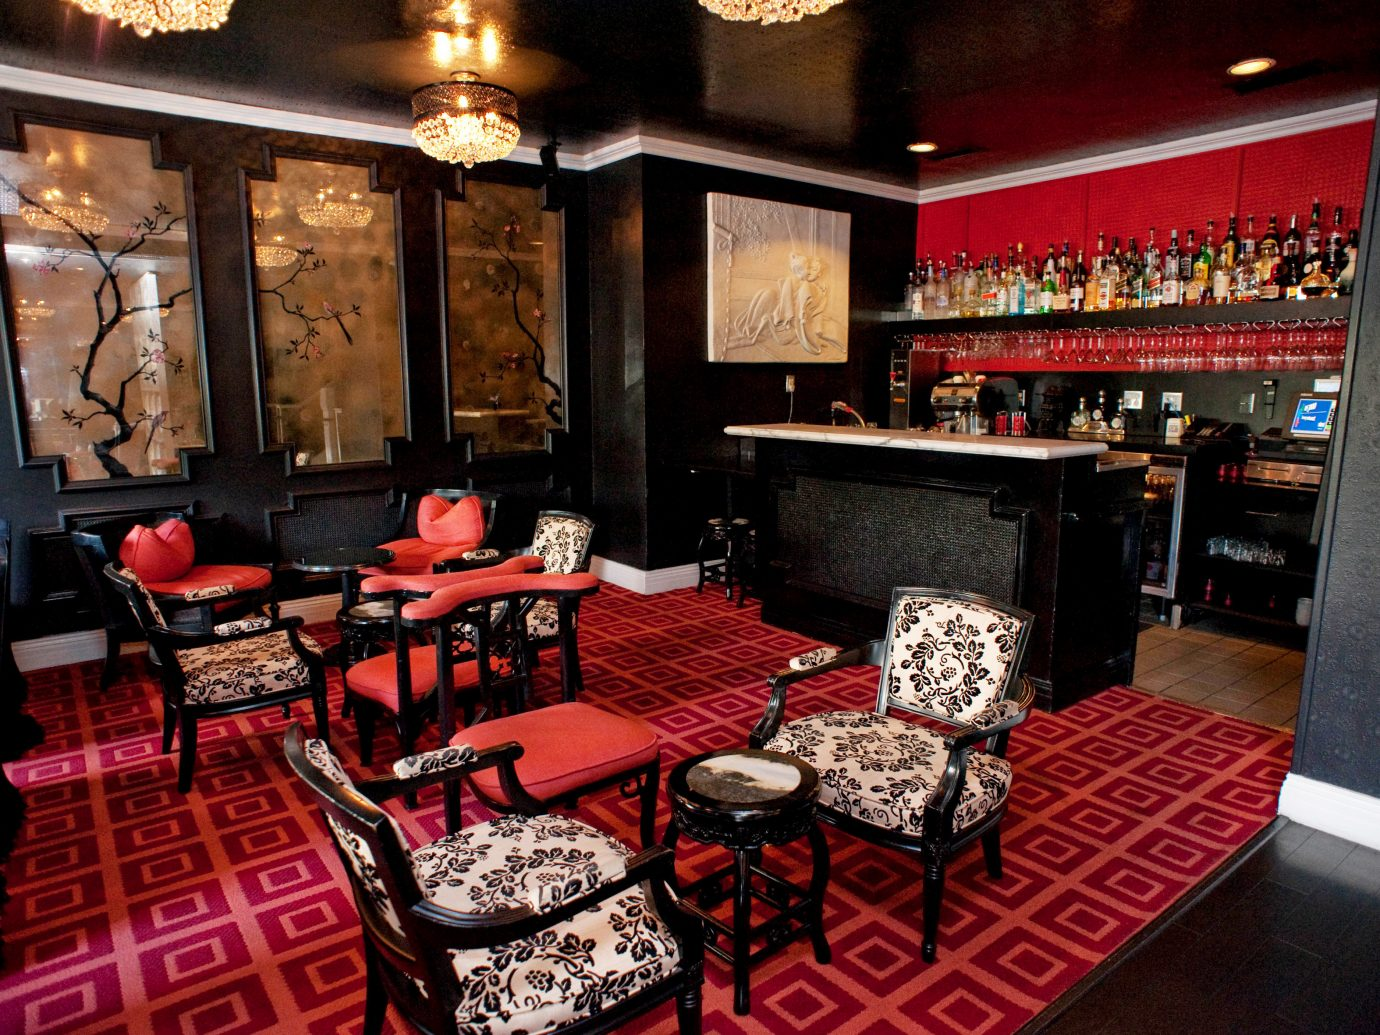 Hotels indoor floor red room restaurant Bar interior design area furniture several